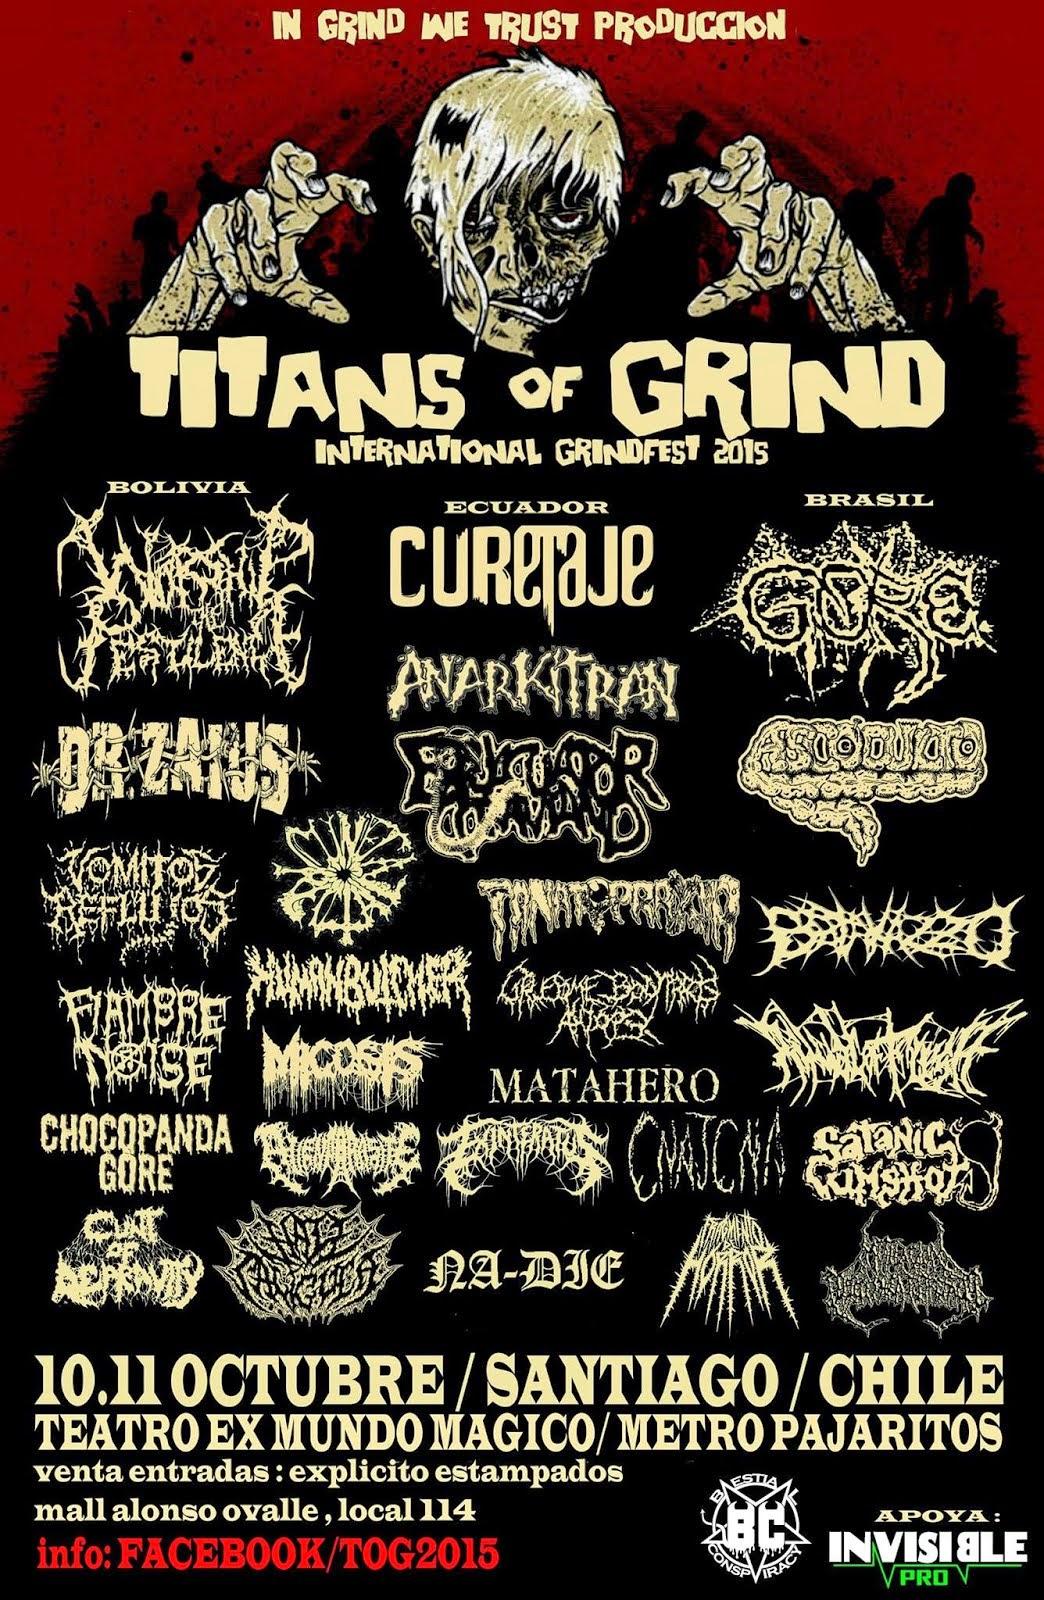 TITANS OF GRIND